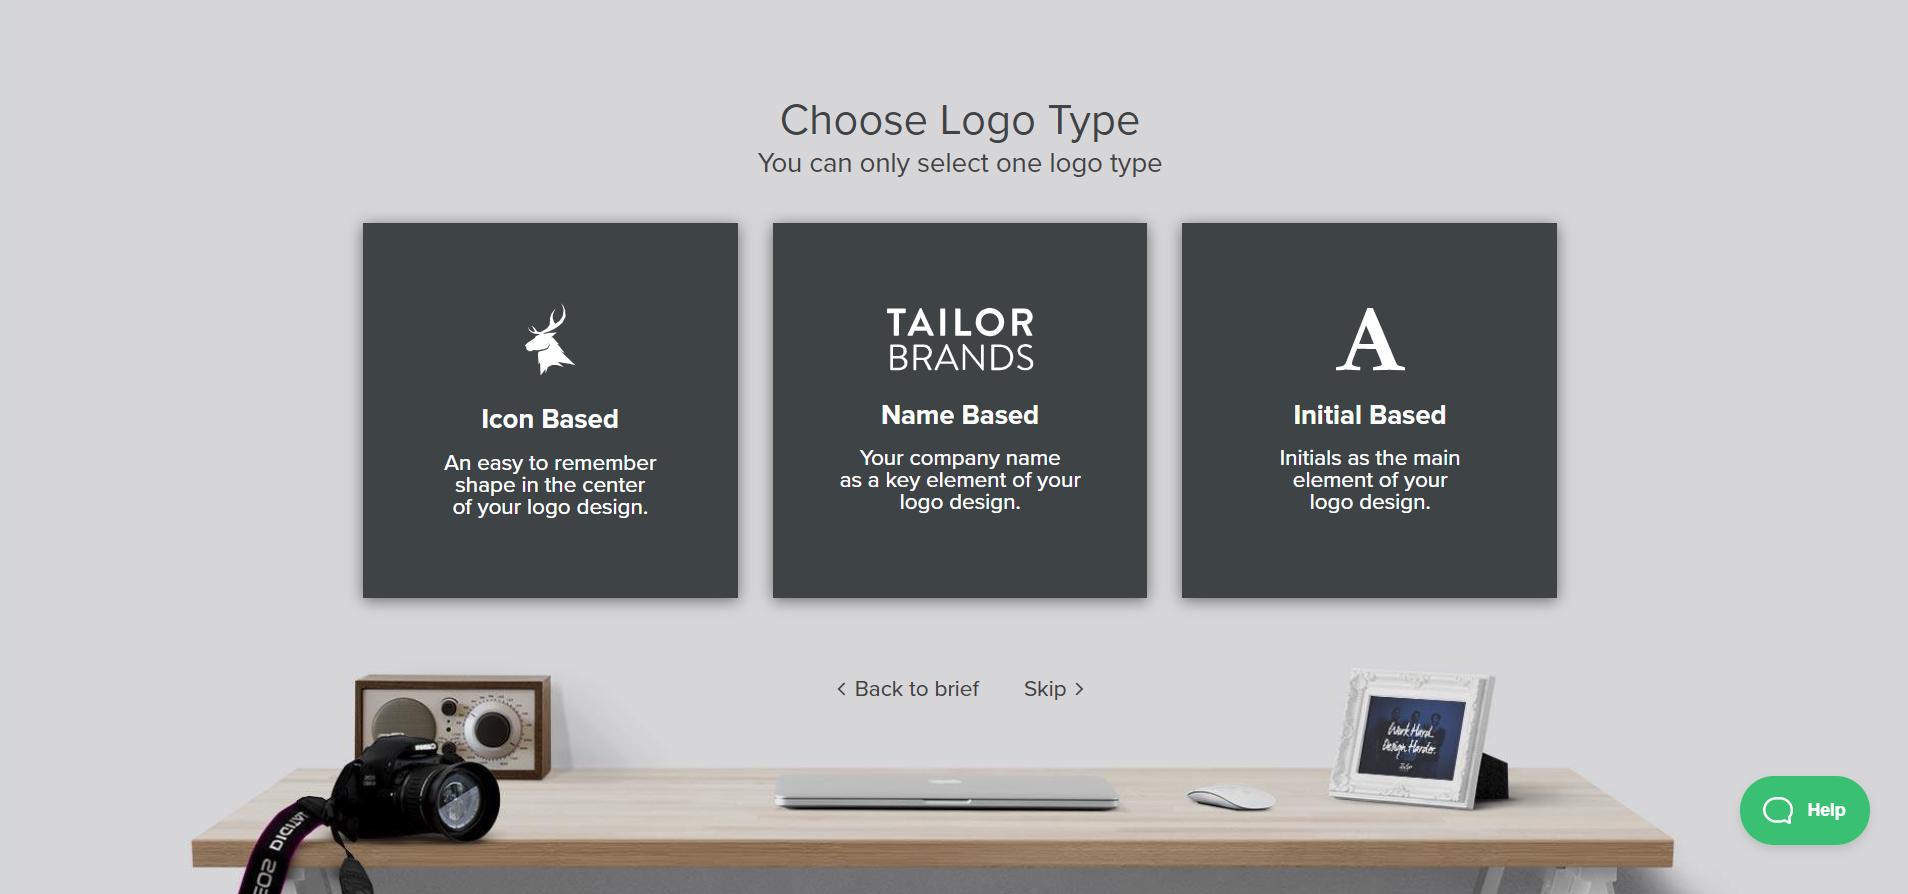 Choosing a Logo Style